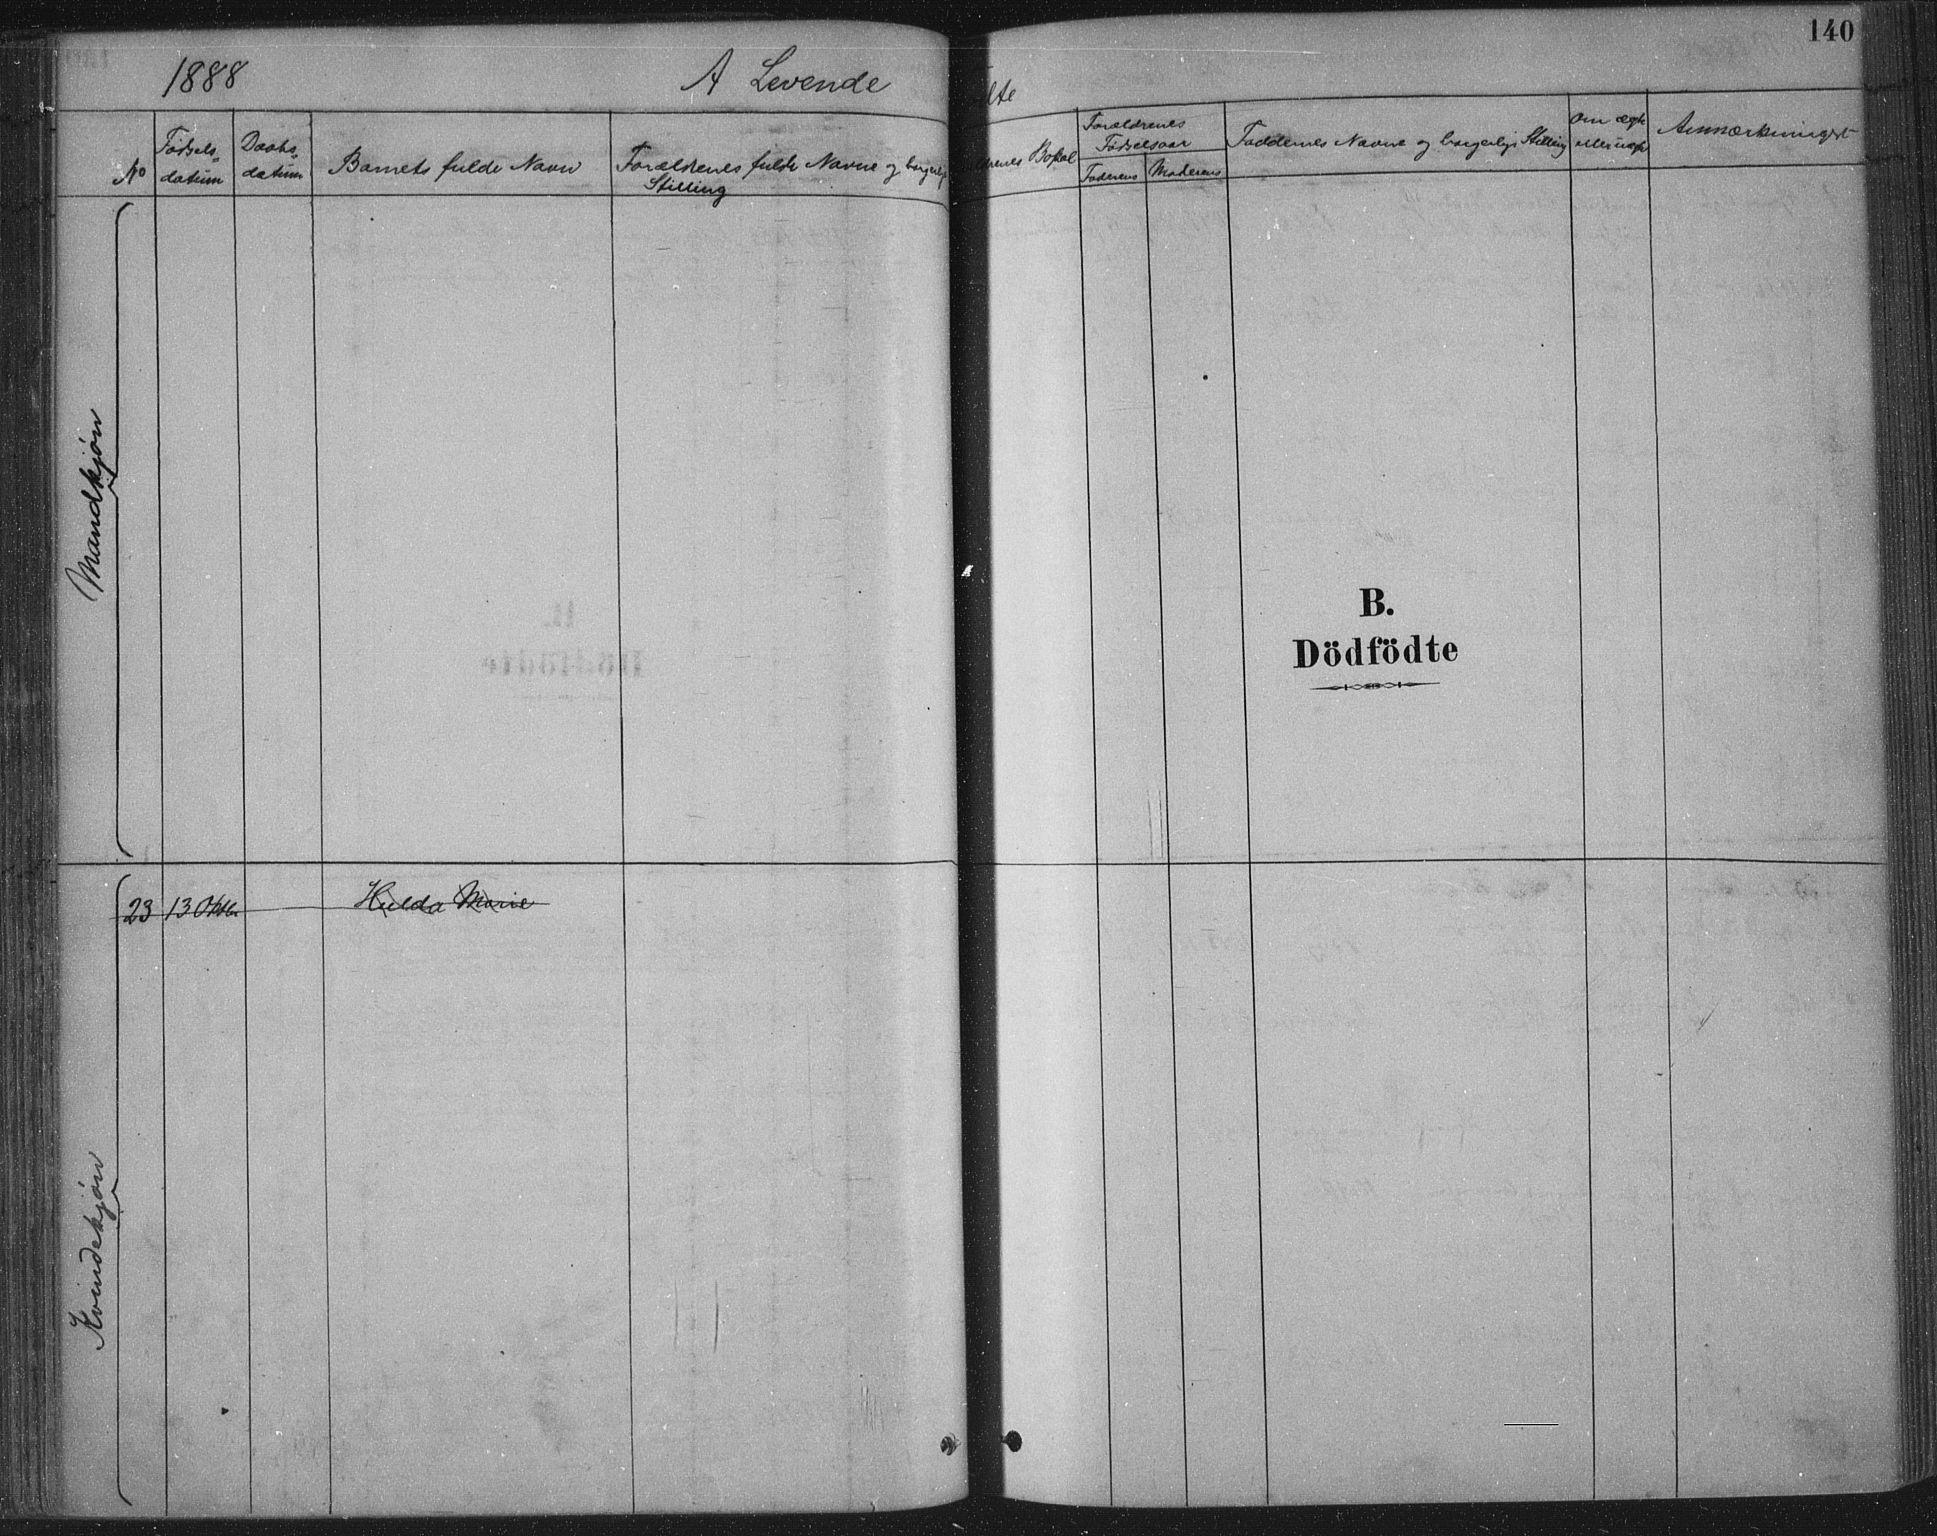 SAKO, Bamble kirkebøker, F/Fa/L0007: Ministerialbok nr. I 7, 1878-1888, s. 140